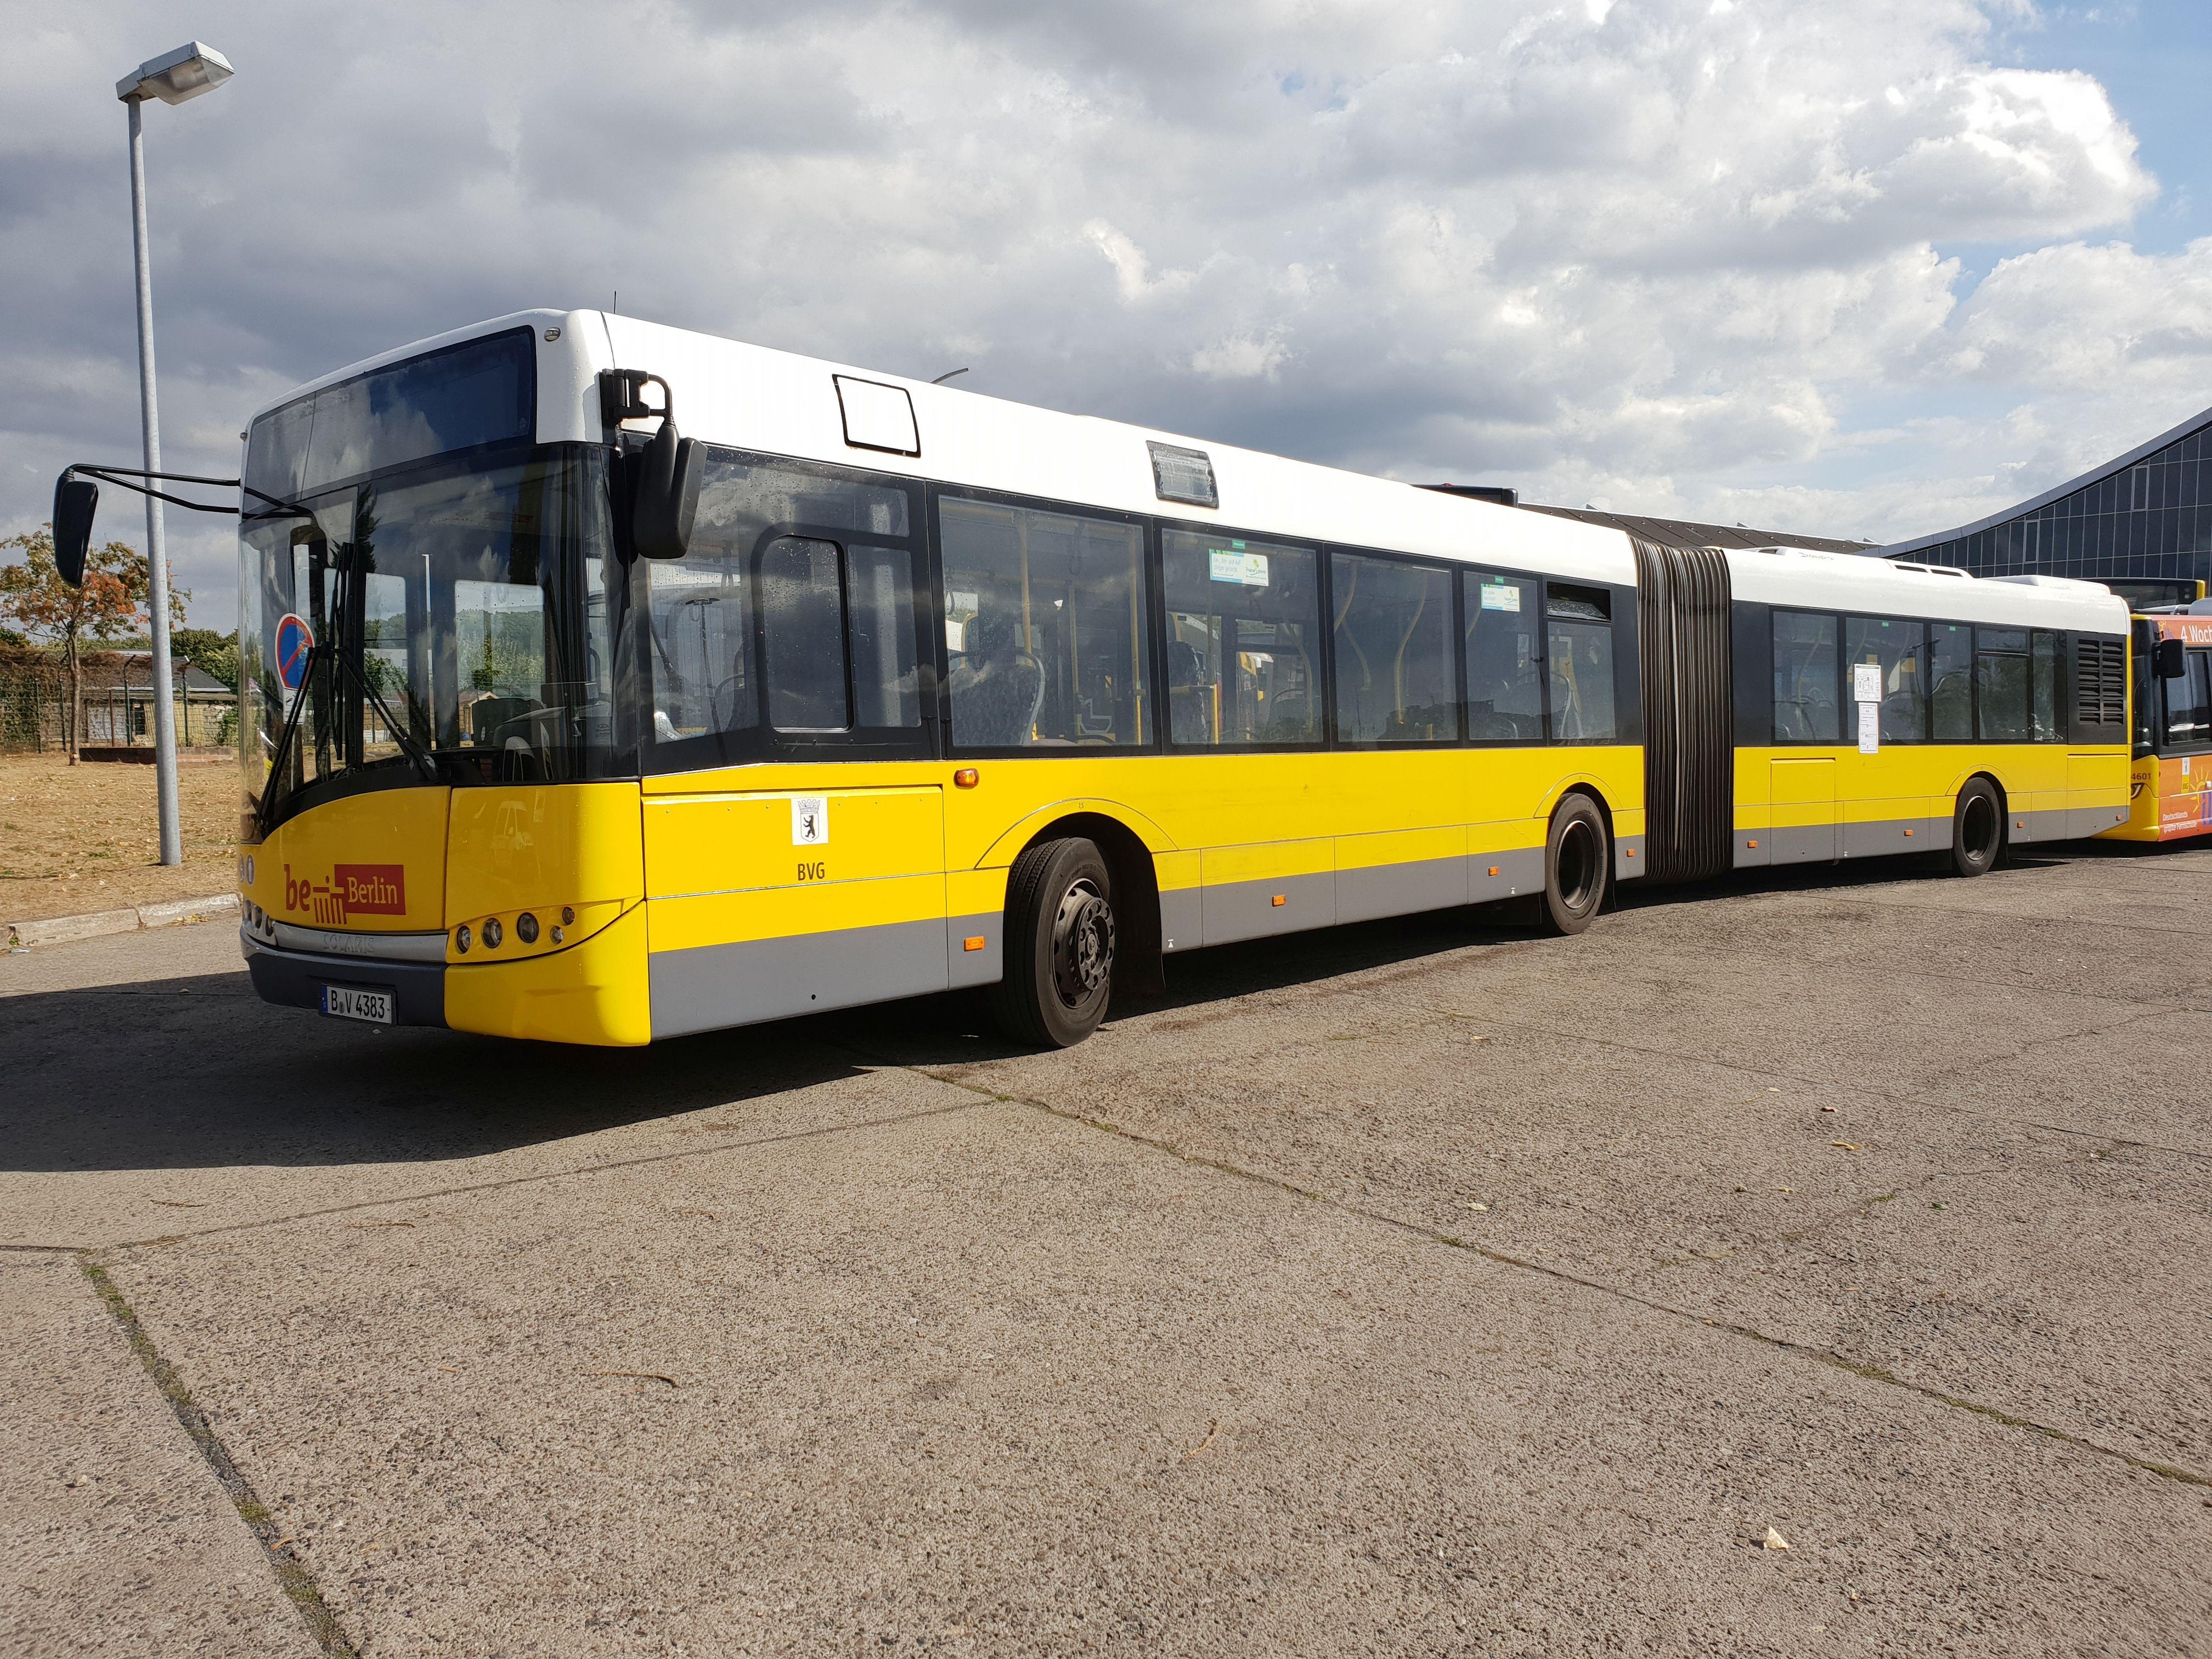 Foto: Bus 4383, Typ Solaris Urbino 18, Hof Siegfriedstr., September 2018